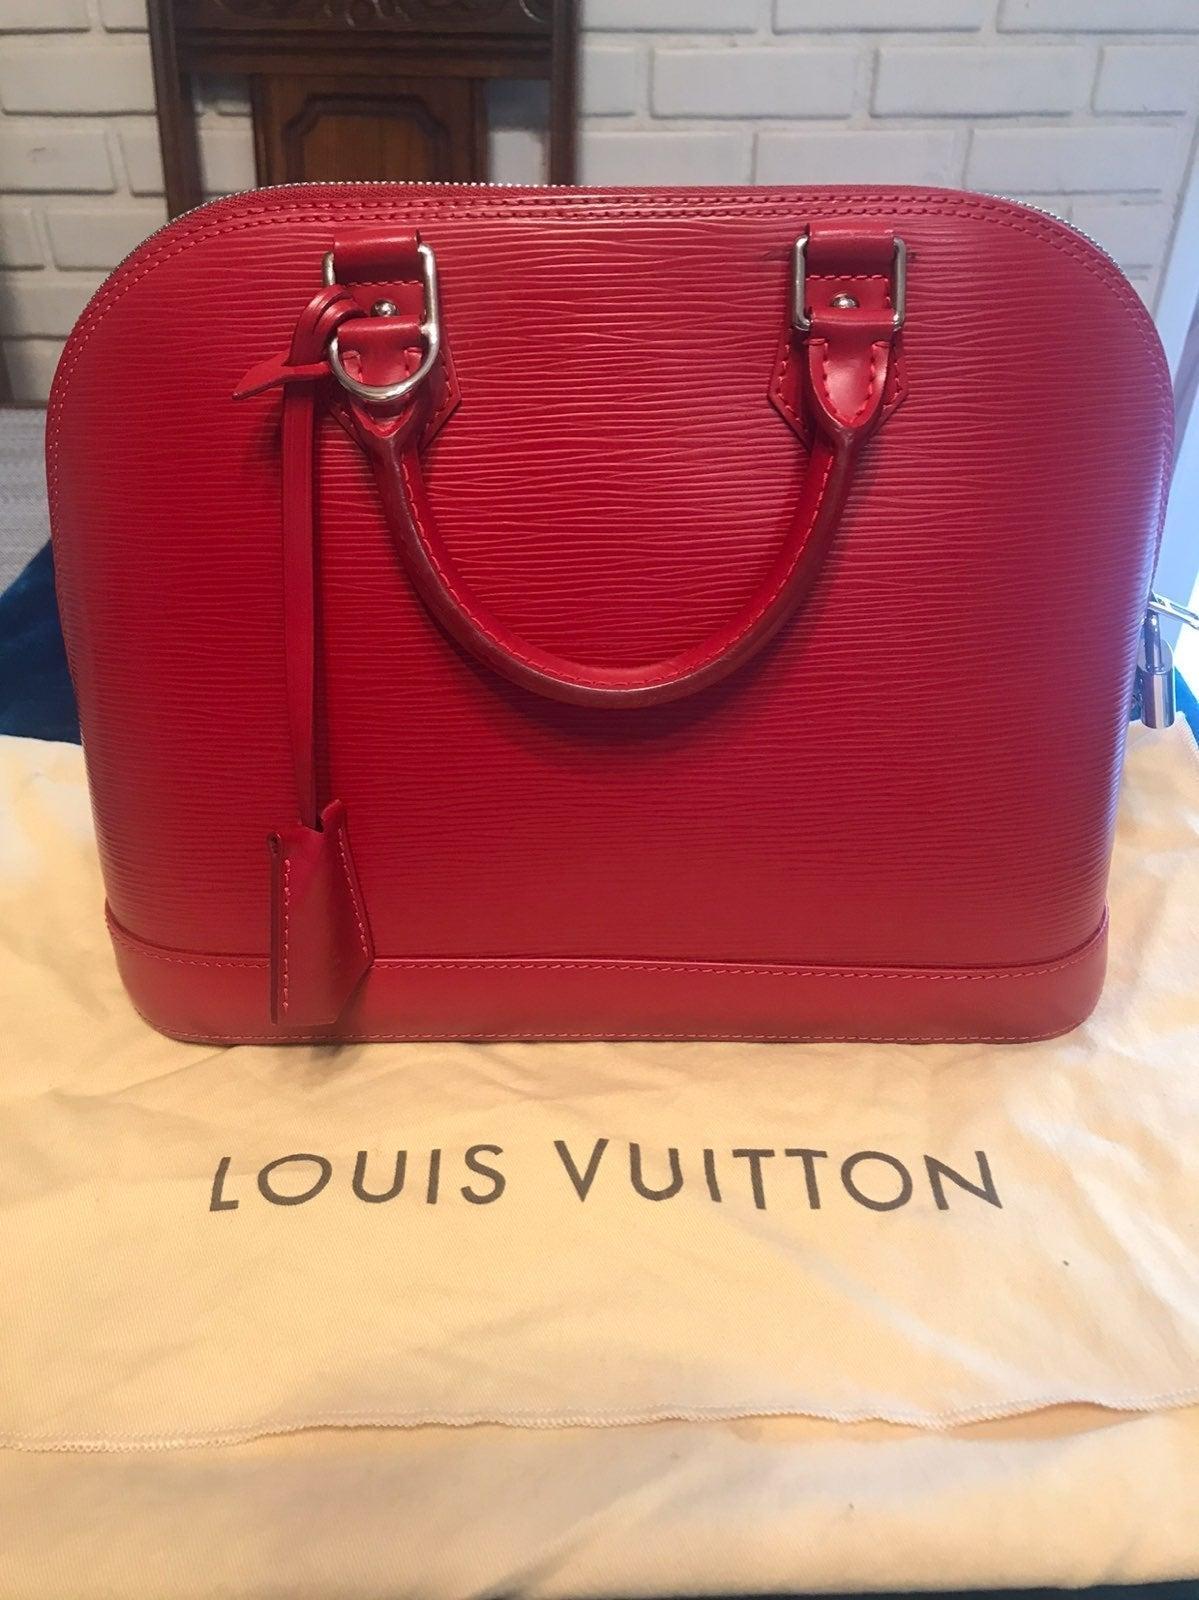 Authentic Louis Vuitton red Alma PM bag